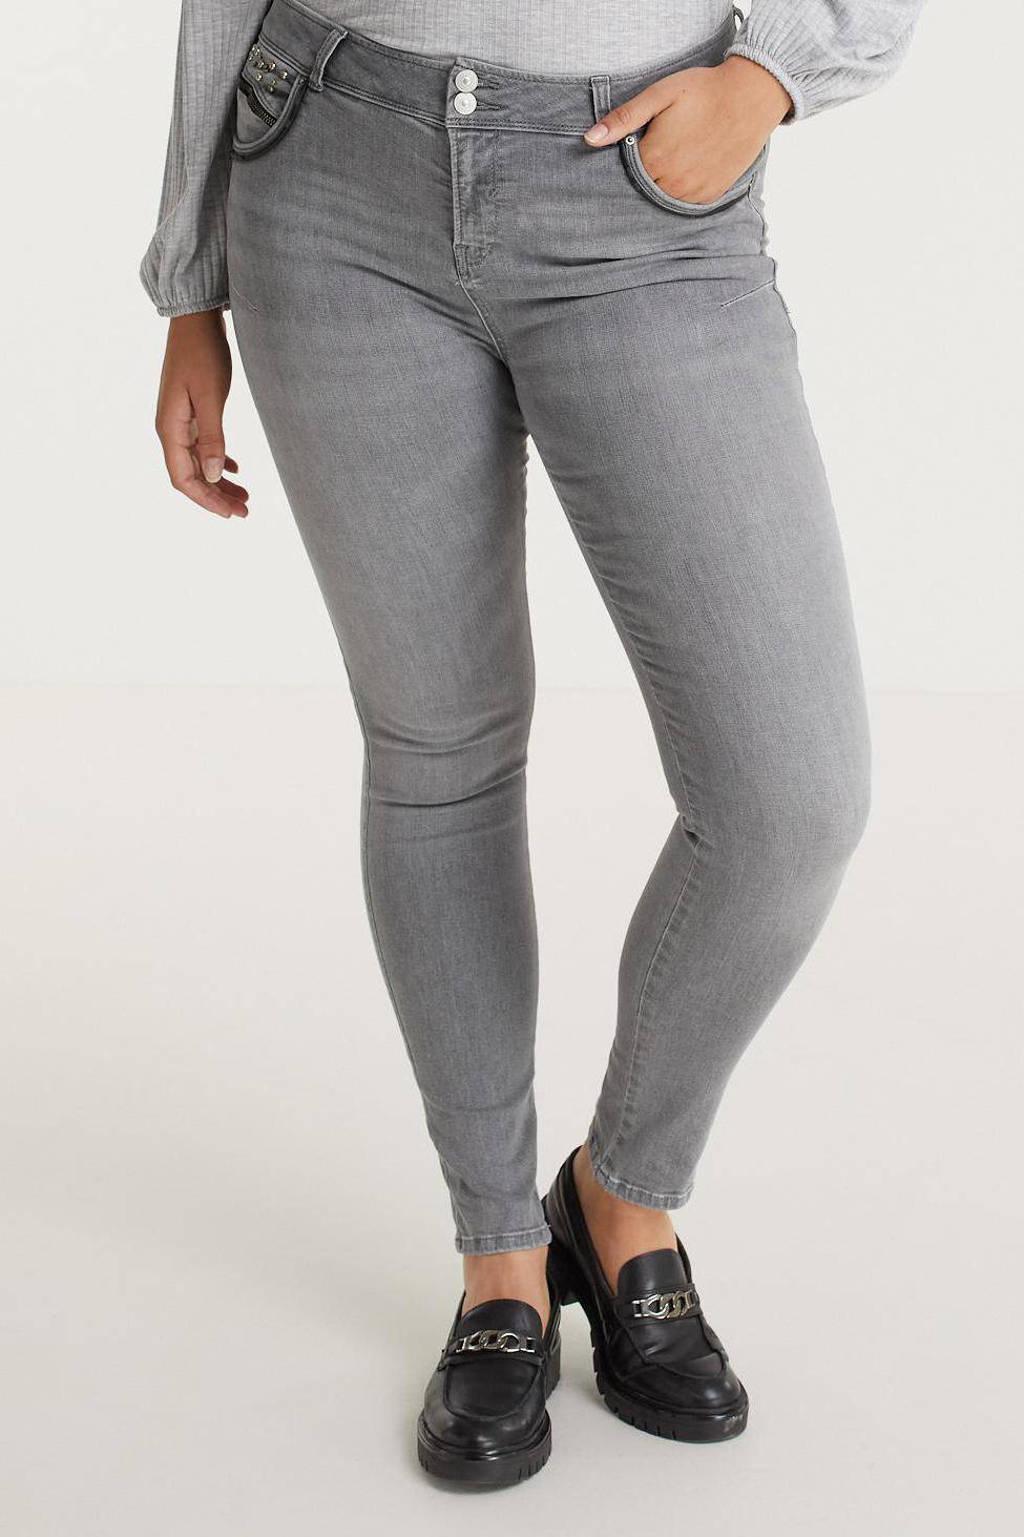 LTB jeans Love to be skinny jeans ROSELLA 53393 nina wash, 53393 Nina Wash